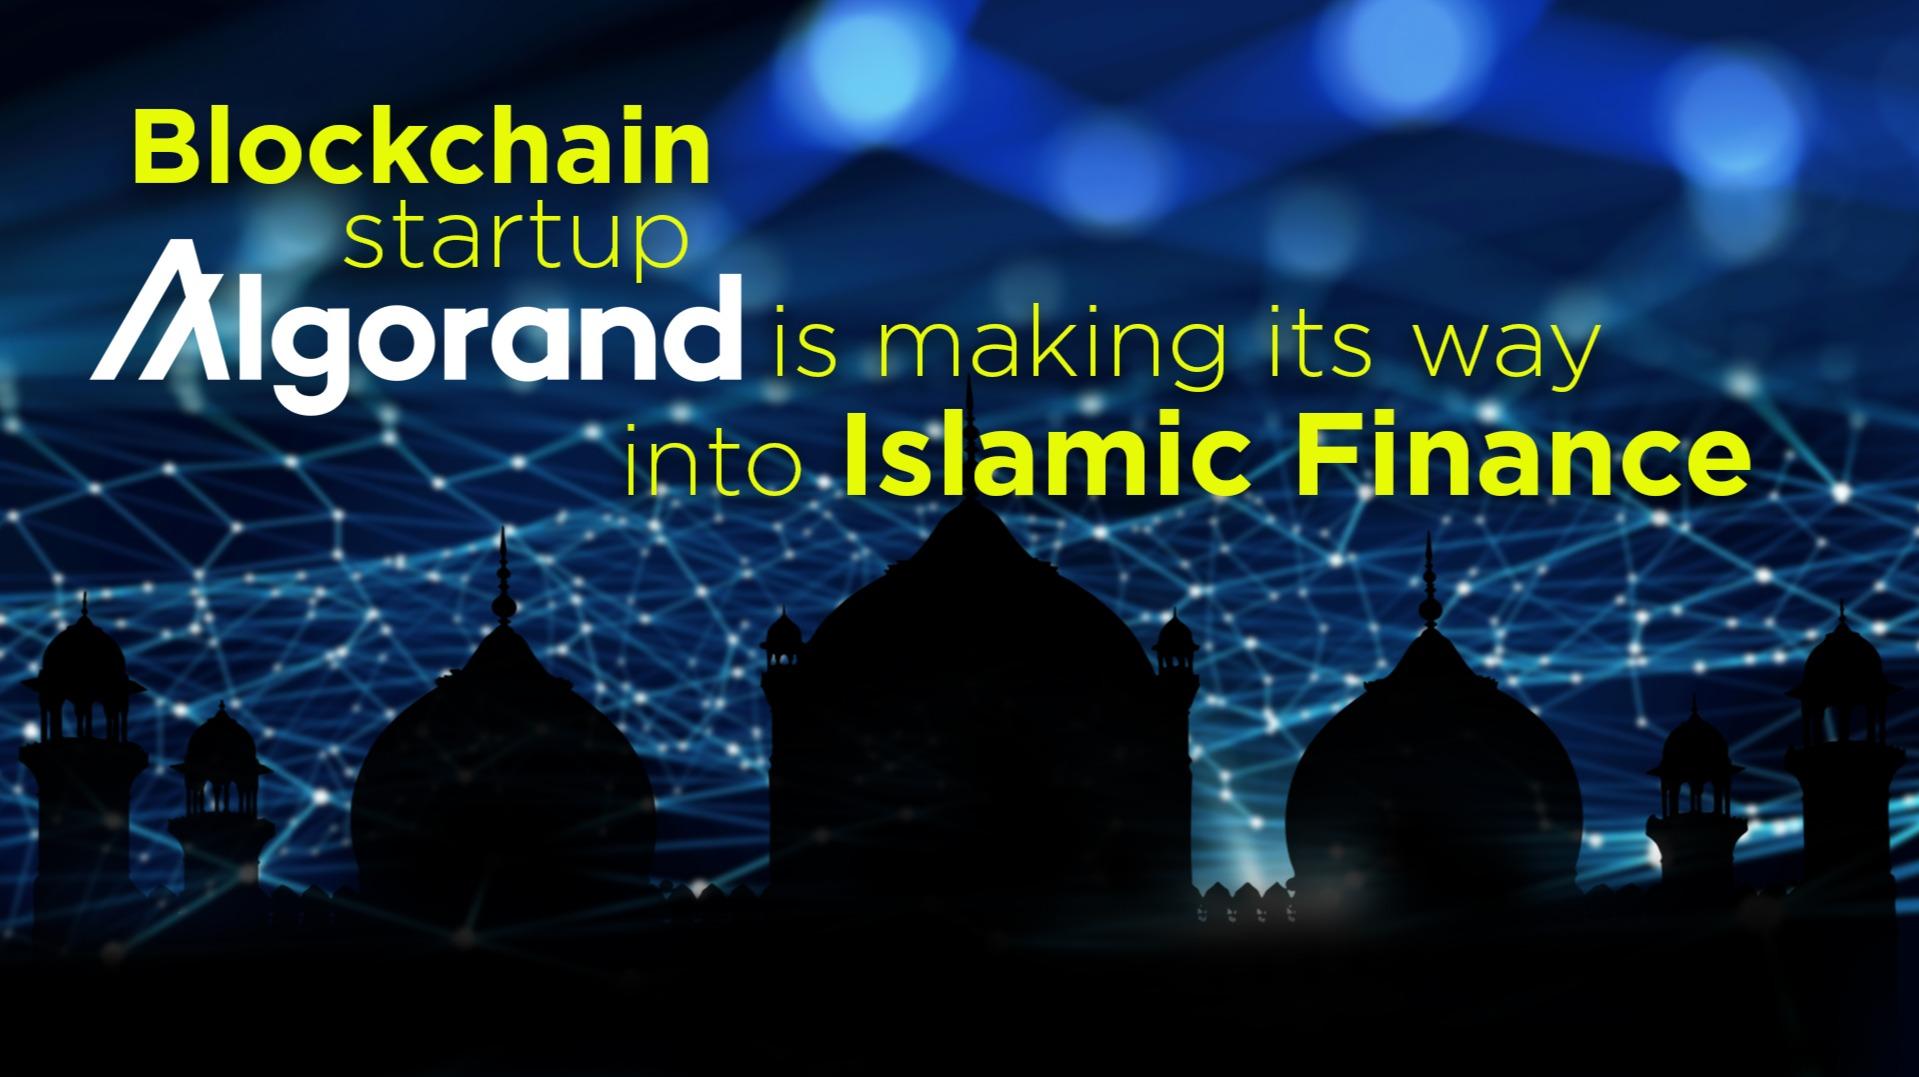 Blockchain startup Algorand is making its way into Islamic finance